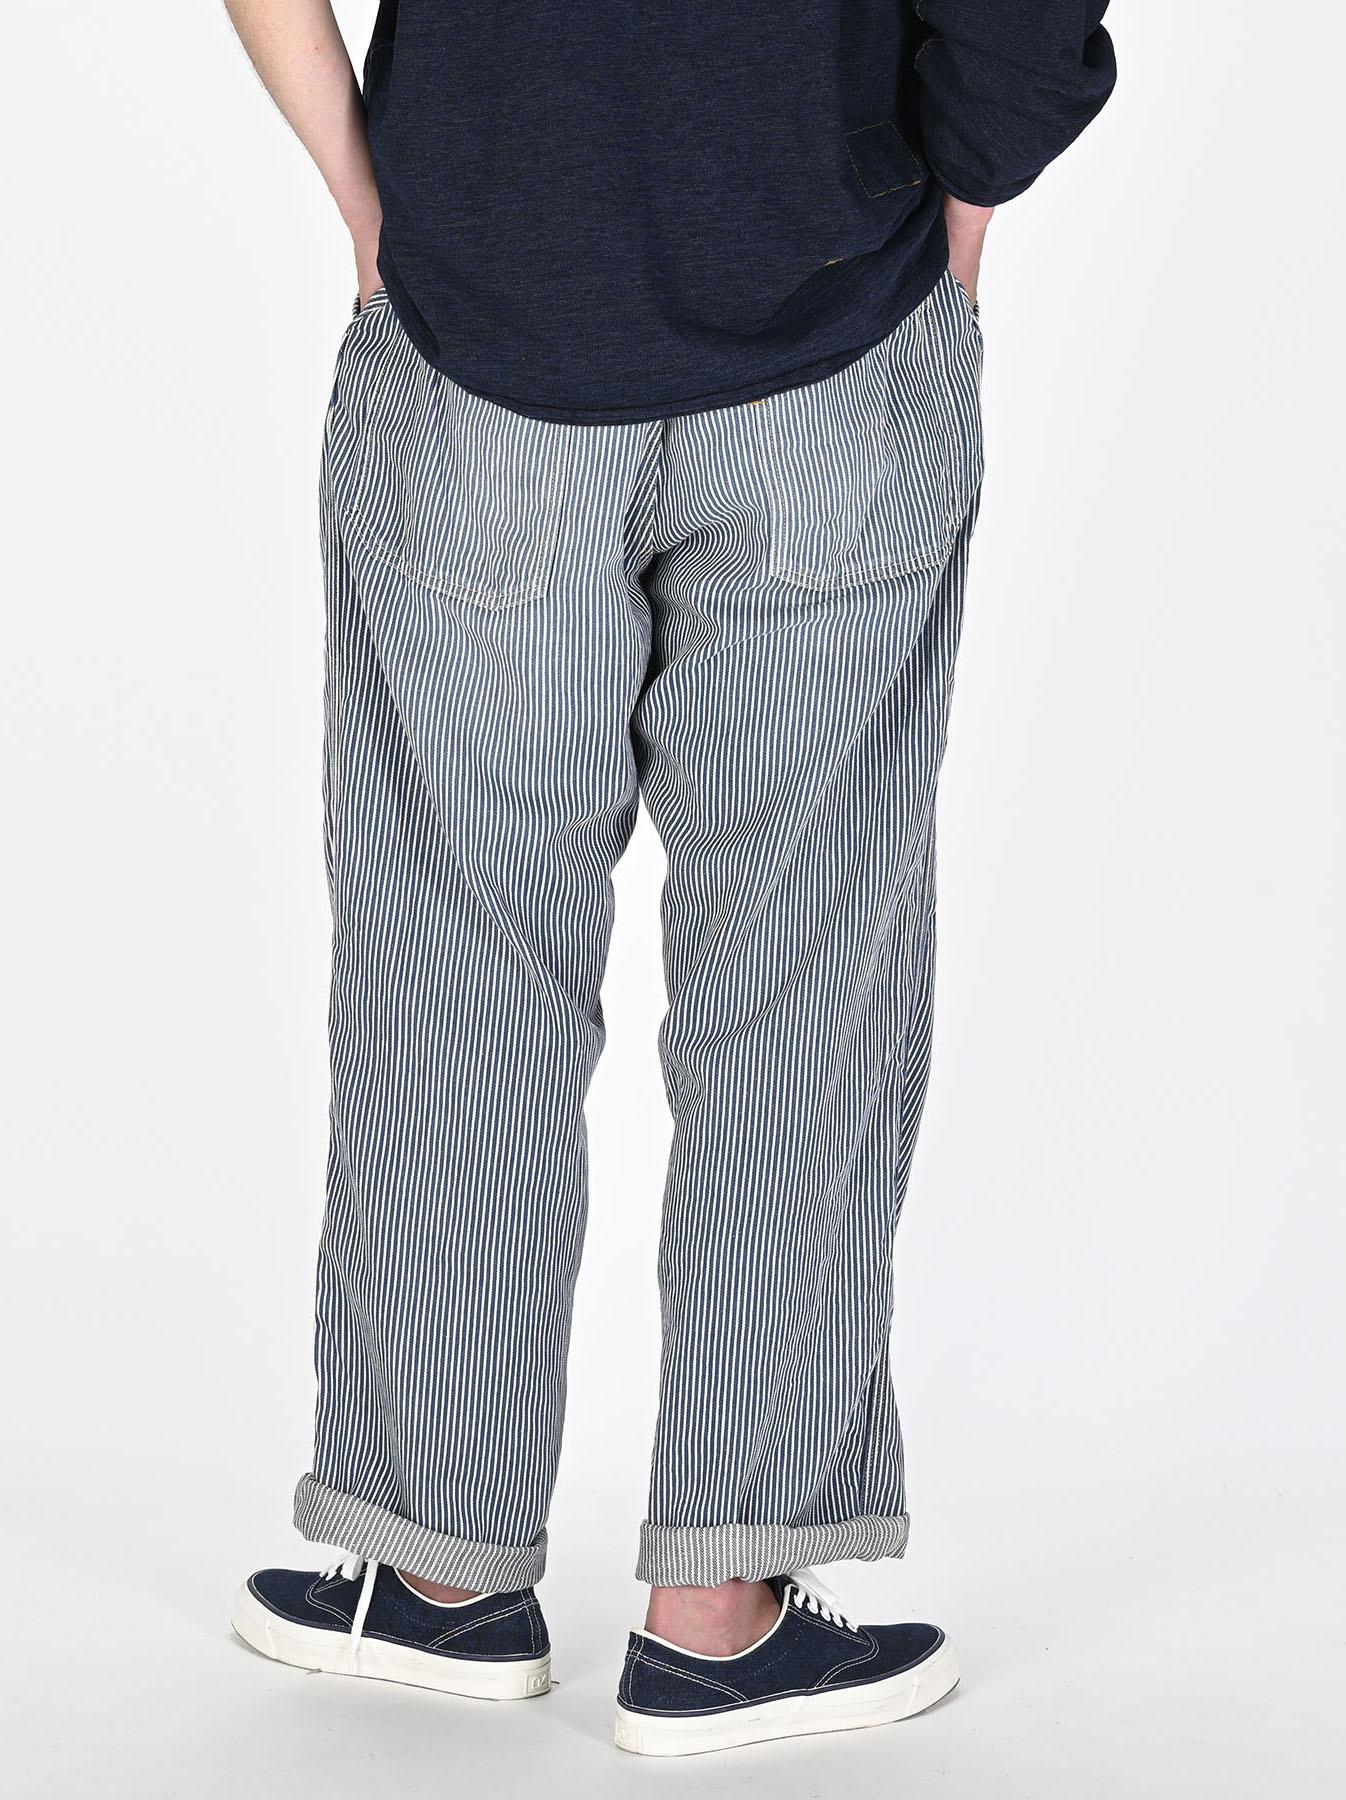 Indigo 908 Painter Pants Distressed (0721)-8